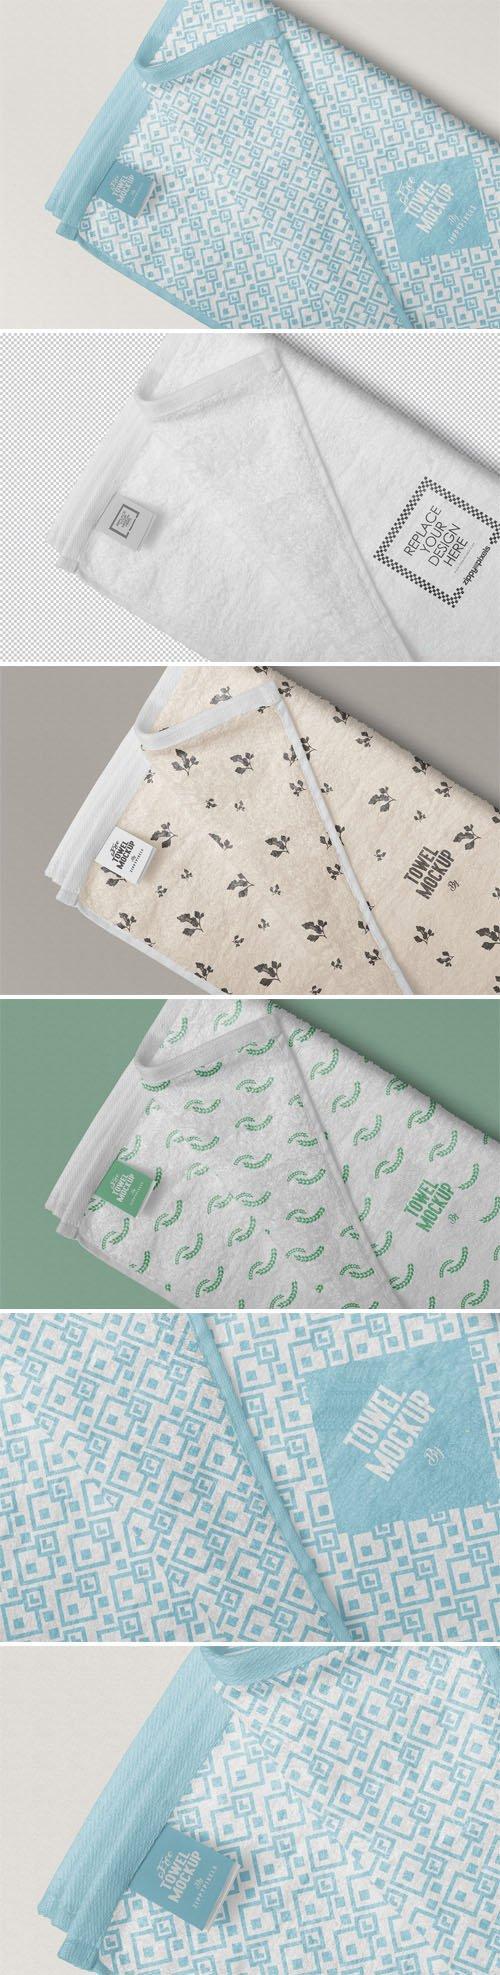 Elegant Towel PSD Mockup